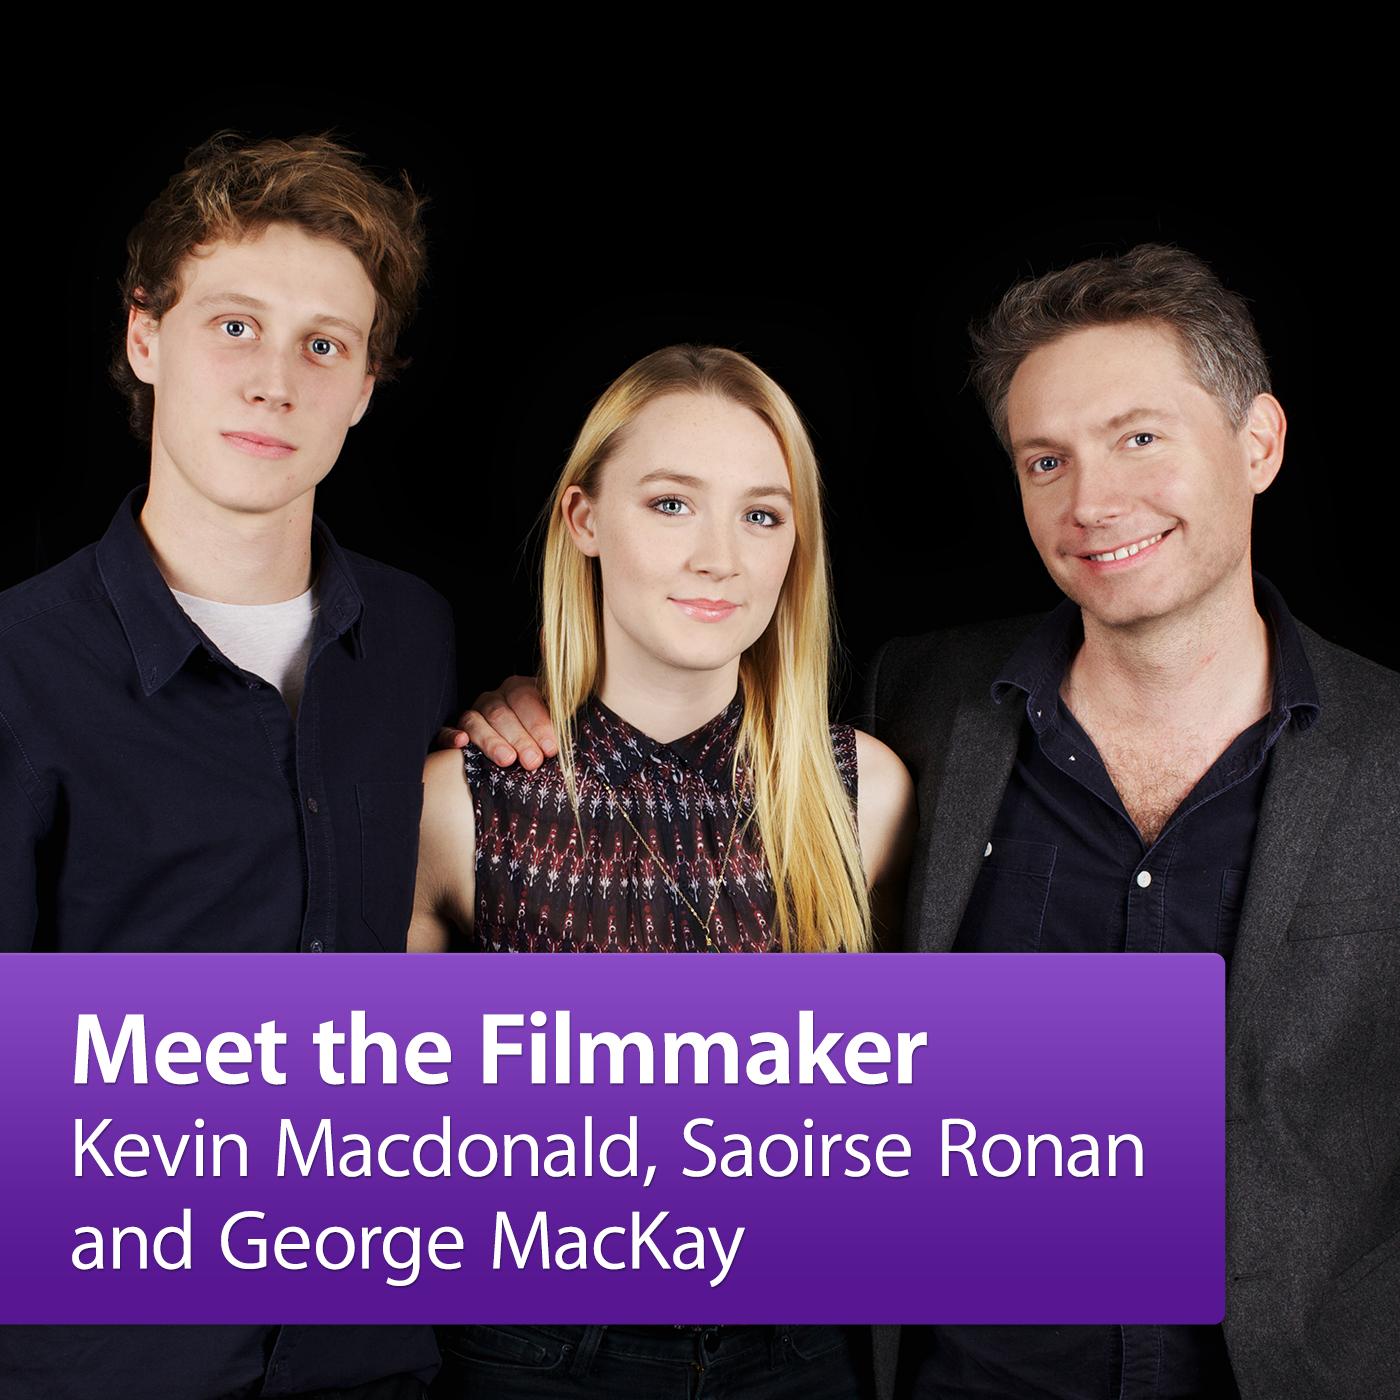 Kevin Macdonald, Saoirse Ronan and George MacKay: Meet the Filmmaker